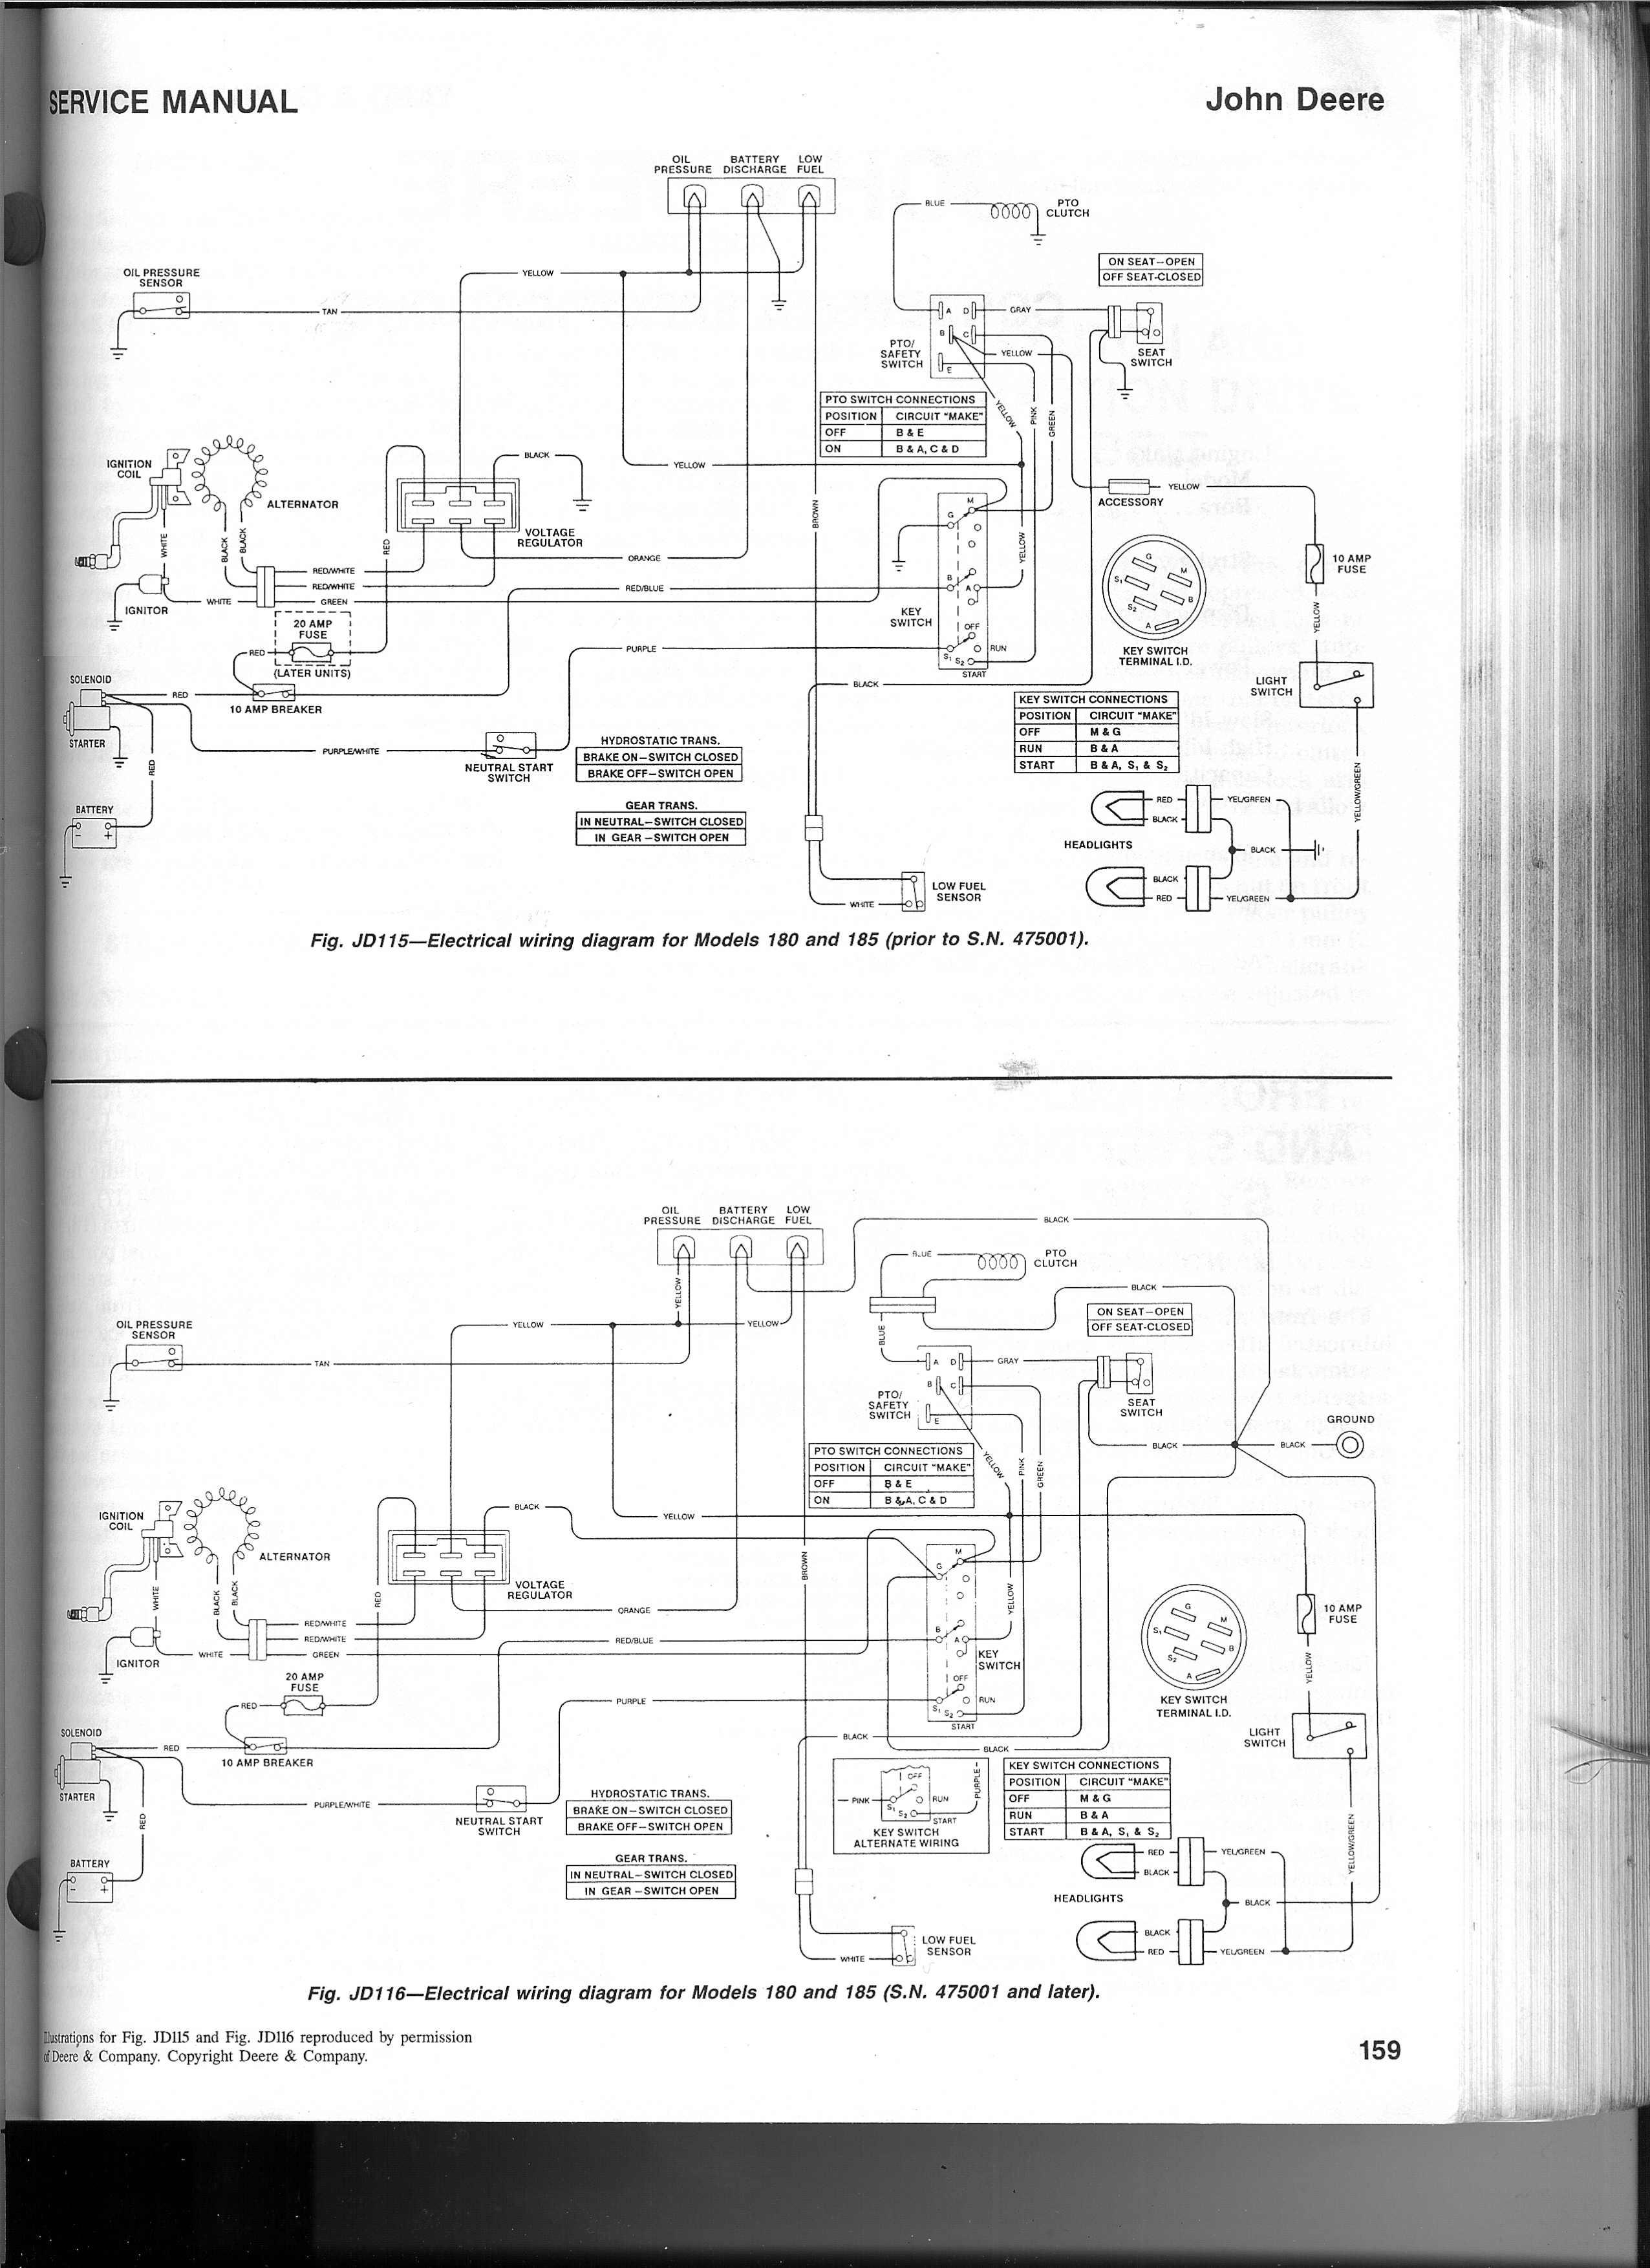 john deere 160 wiring harness john deere 180 wiring harness wiring diagrams  john deere 180 wiring harness wiring